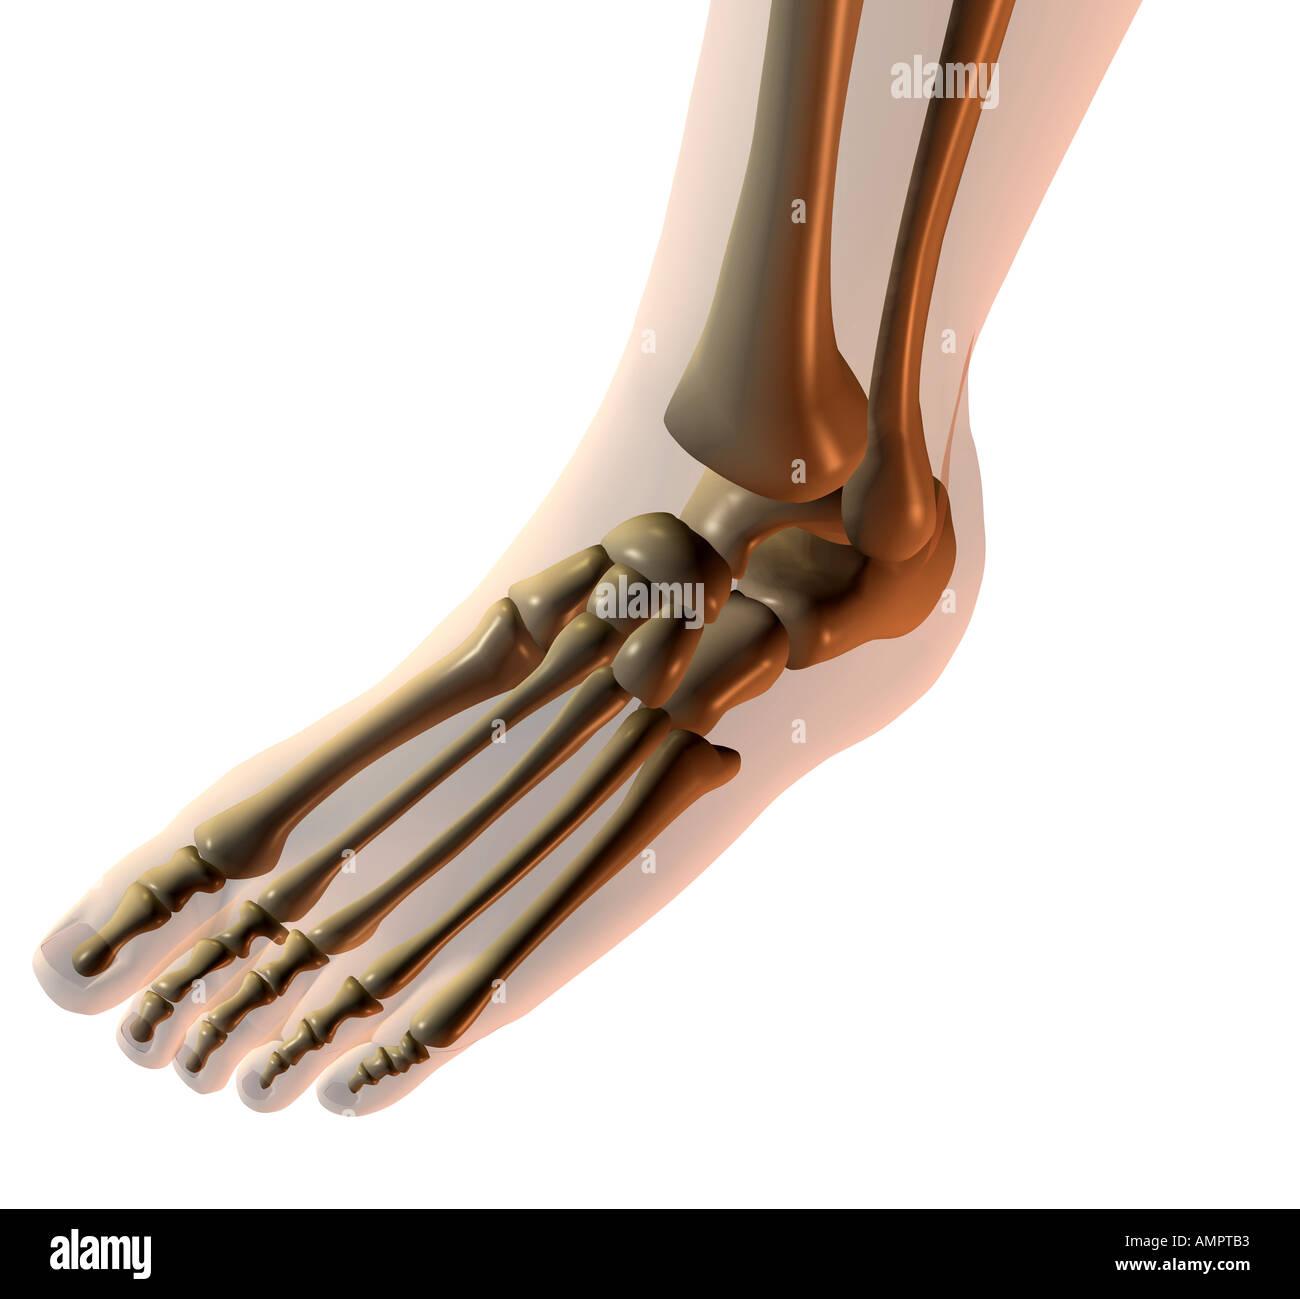 Anatomie-Fuß Stockfoto, Bild: 5001394 - Alamy